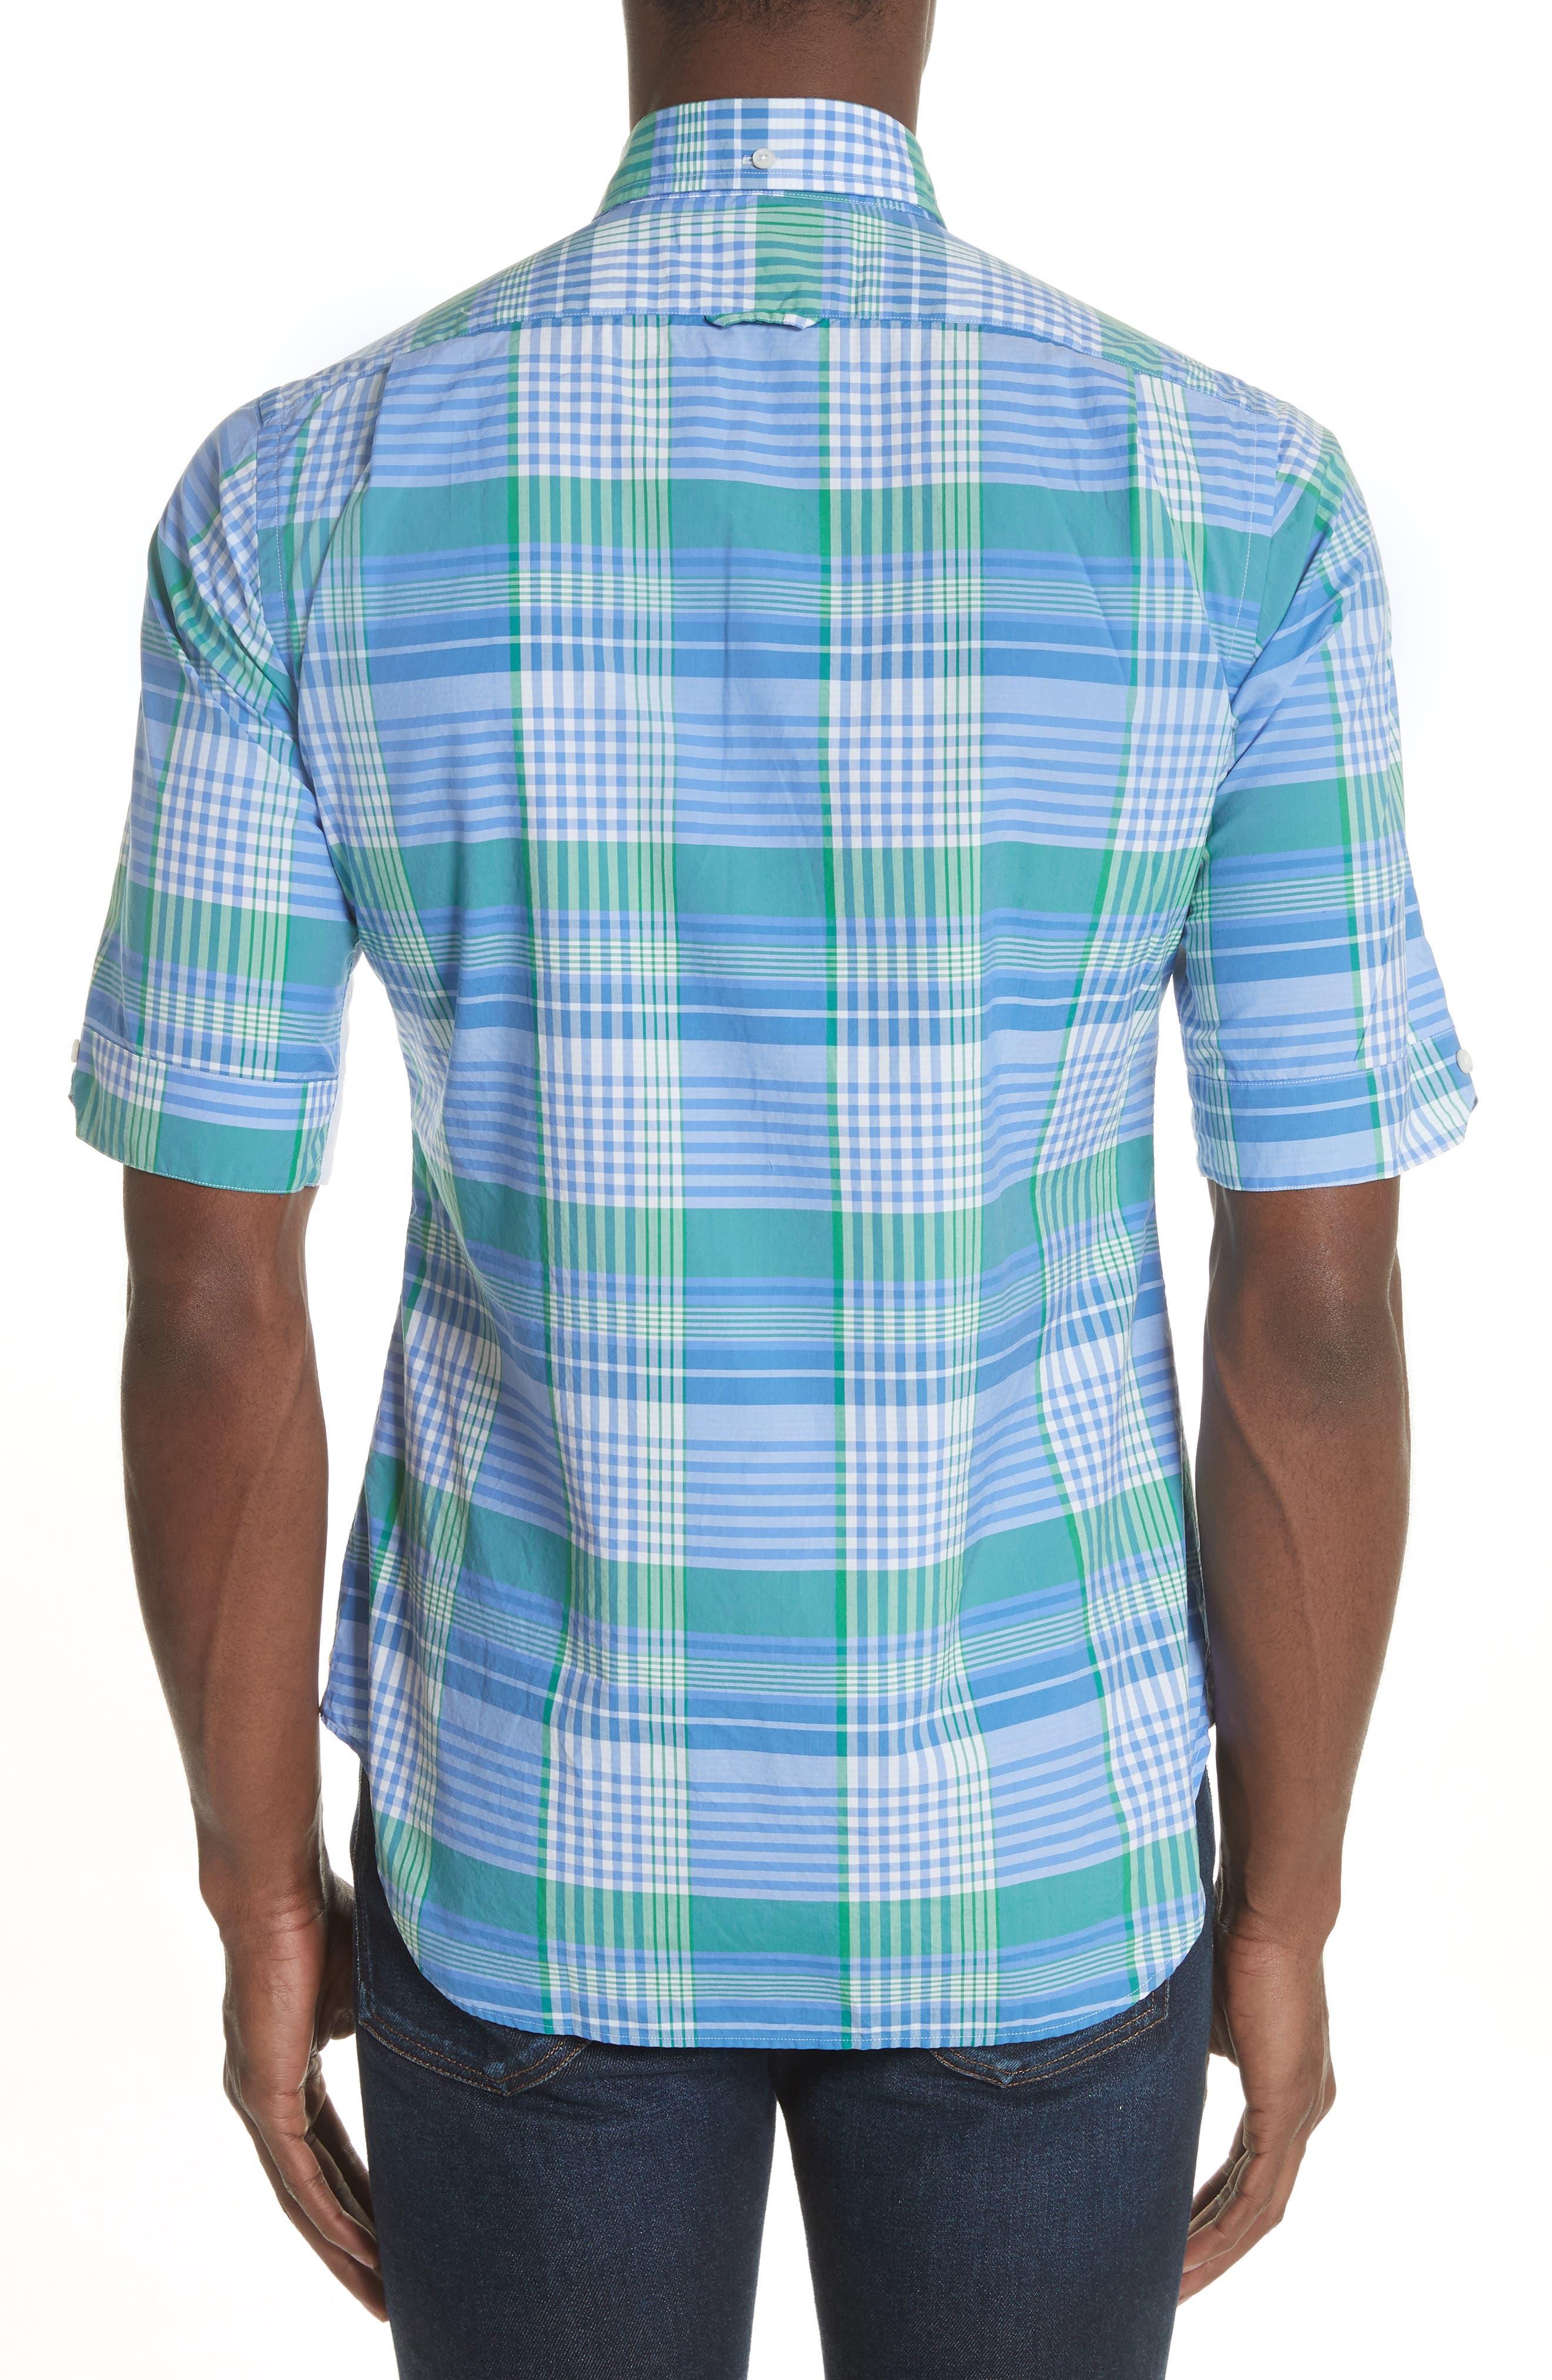 Solid & Plaid Woven Shirt,                             Alternate thumbnail 2, color,                             470